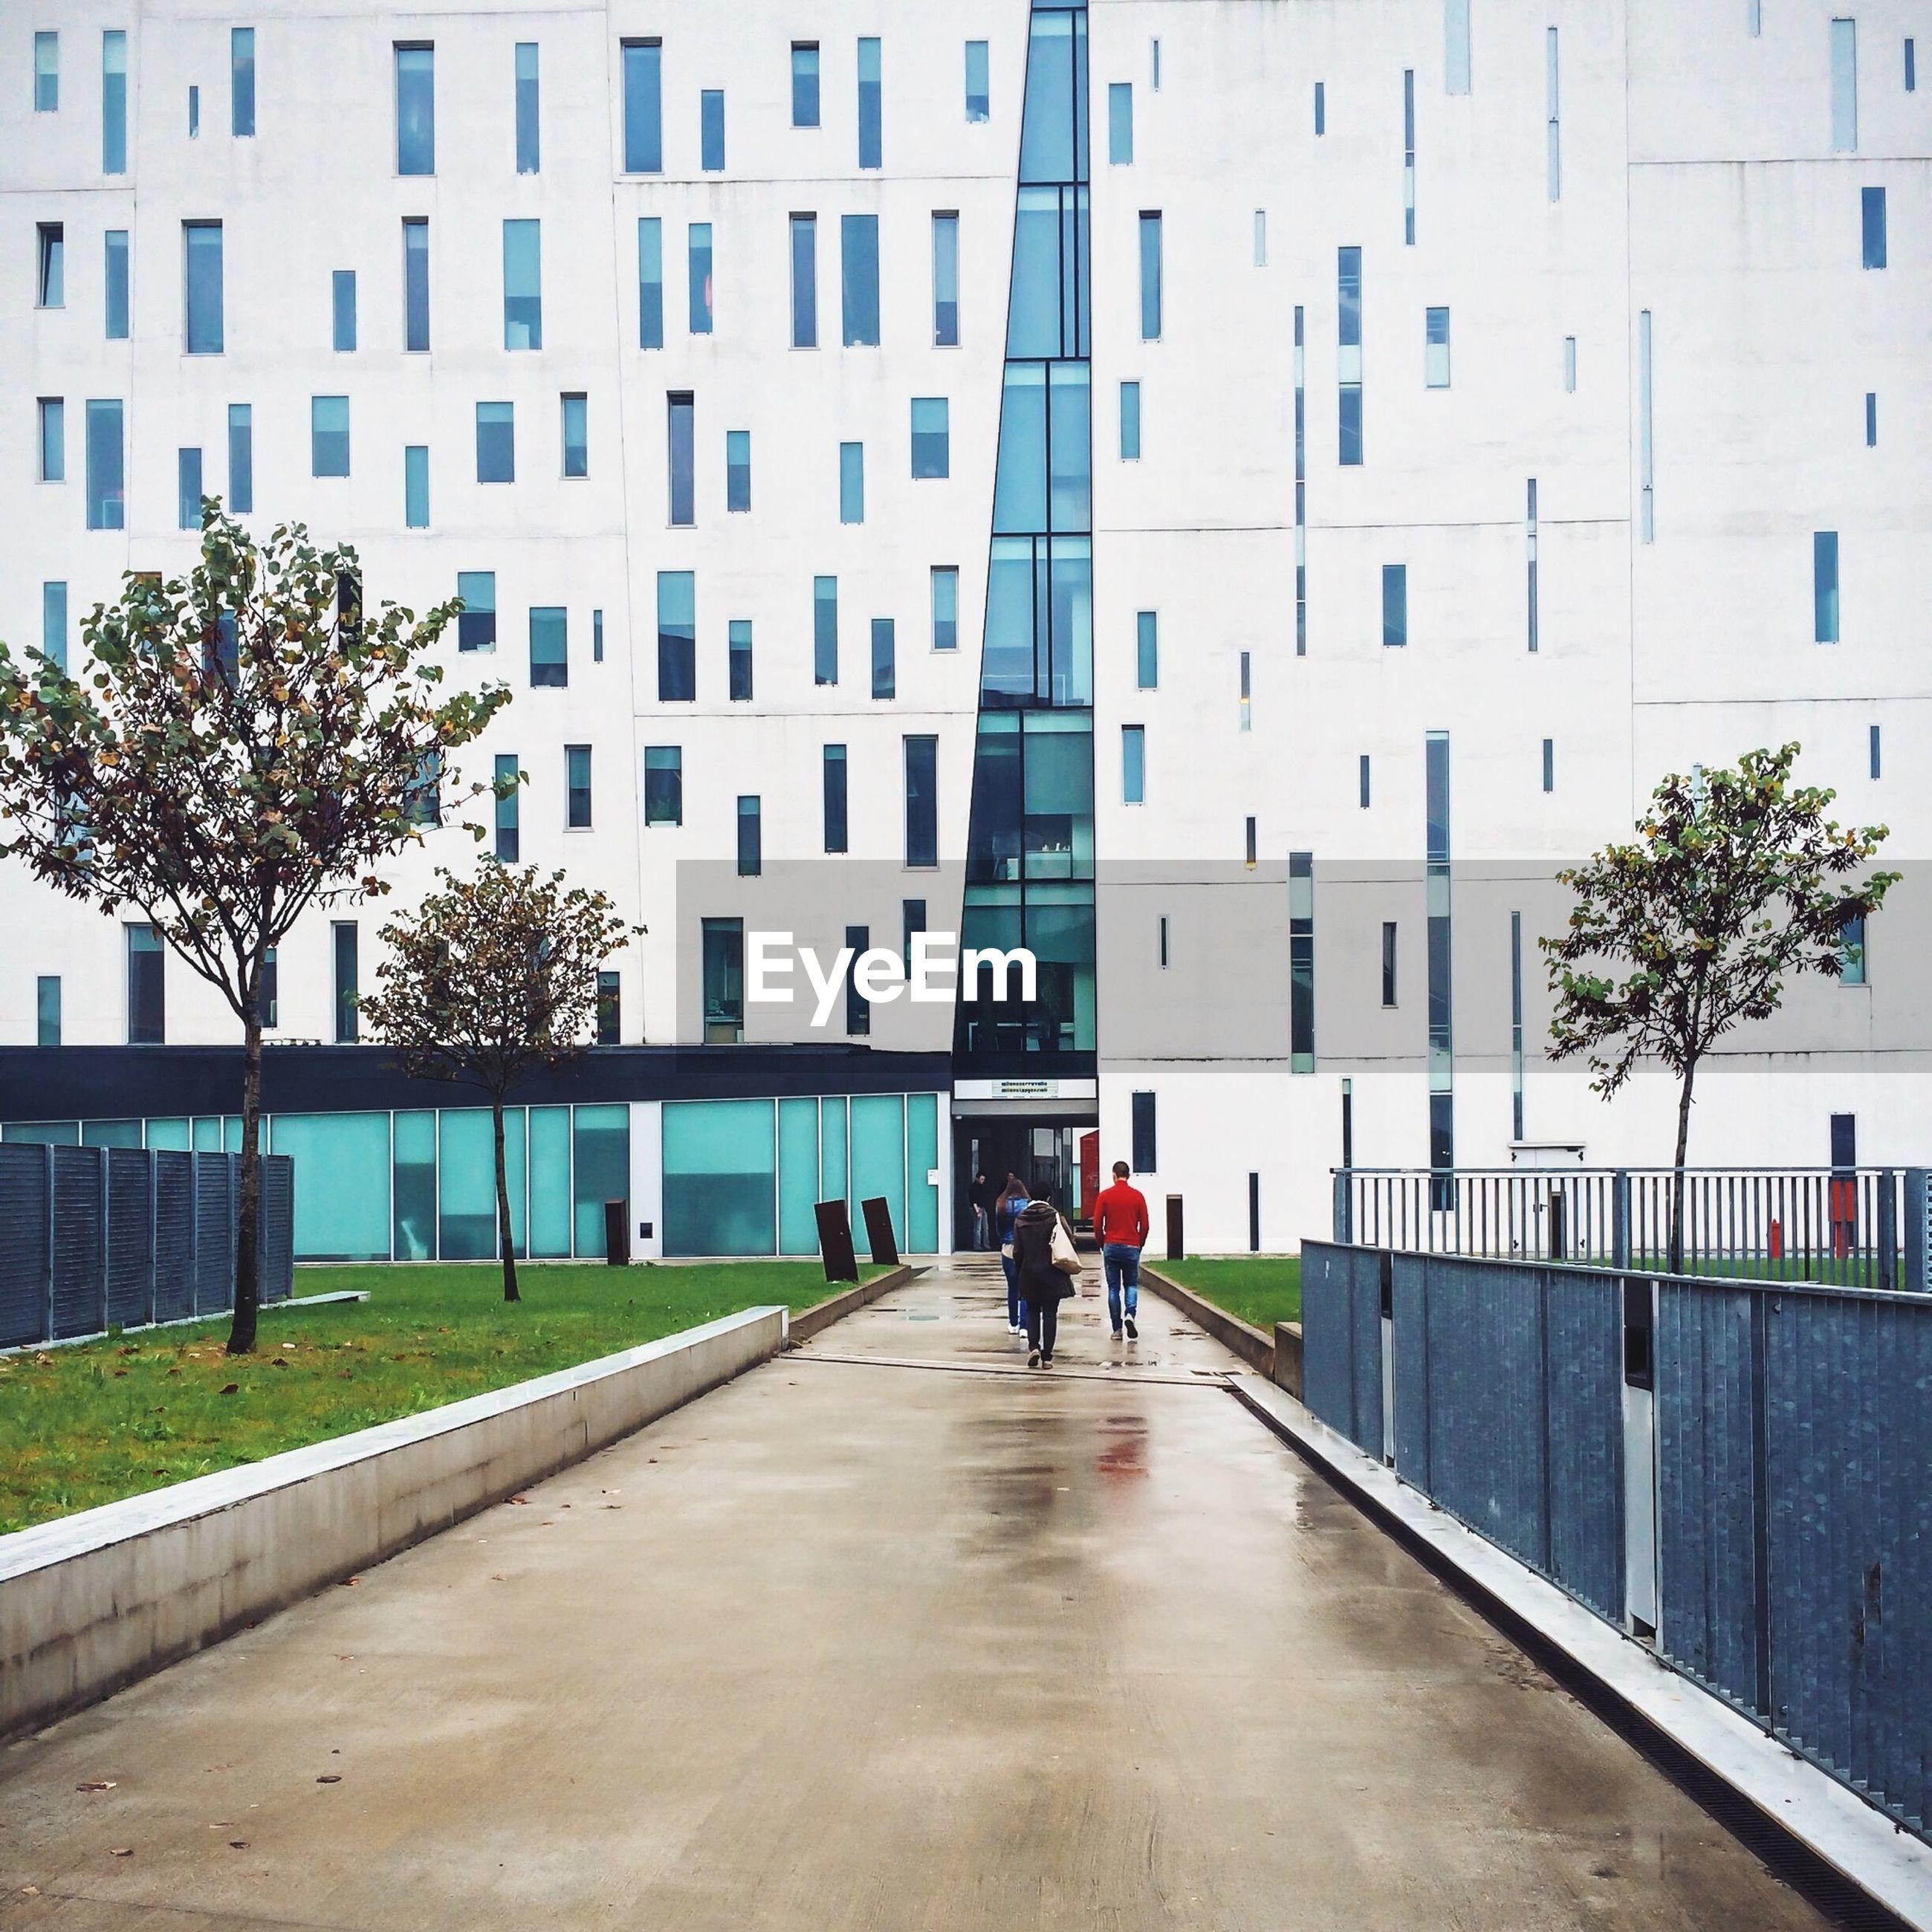 Rear view of people walking in pathway against building